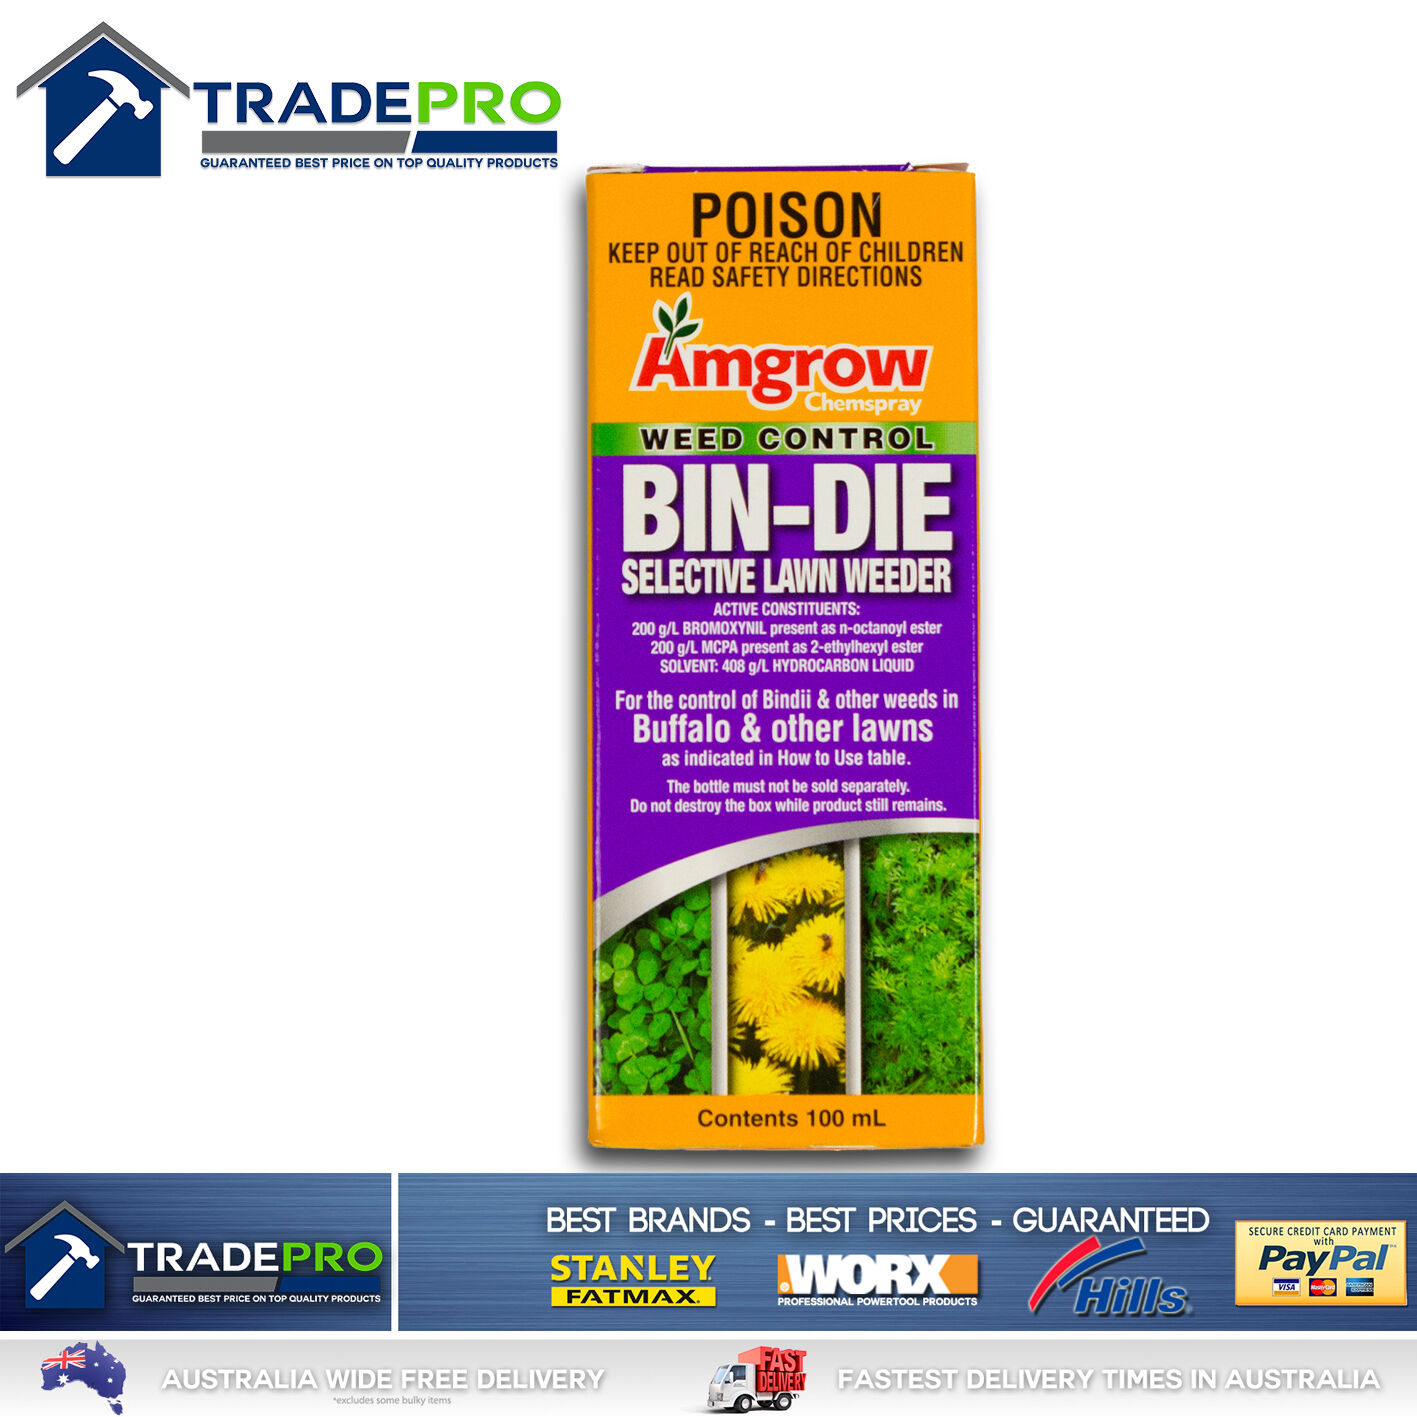 Details about Bin-Die Clover Oxalis Bindi Killer Selective Lawn Weed Kill  100ml Buffalo Safe